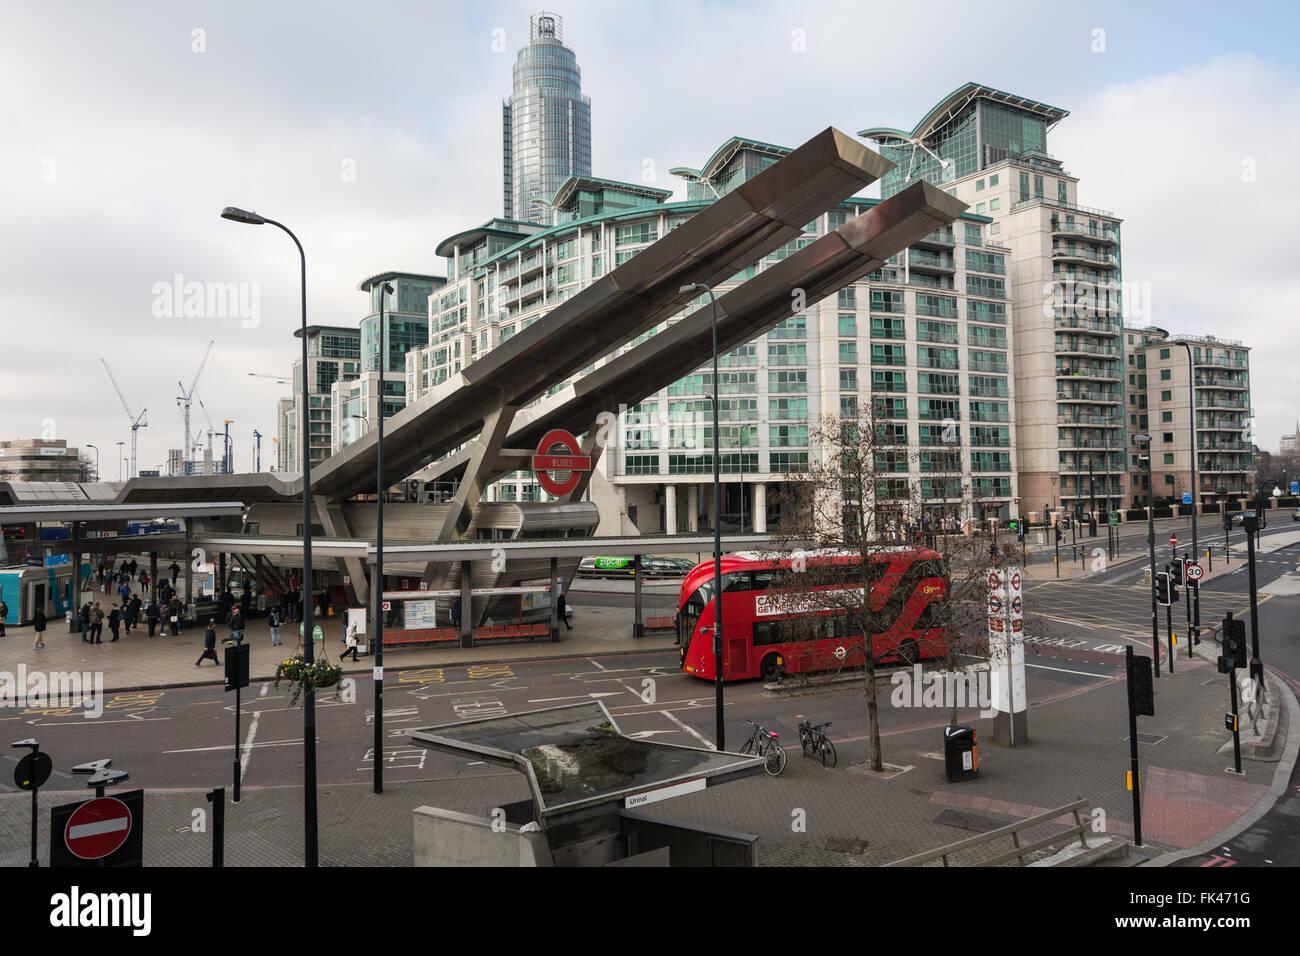 Vauxhall Cross transport interchange, in the London Borough of Lambeth, London,  United Kingdom - Stock Image